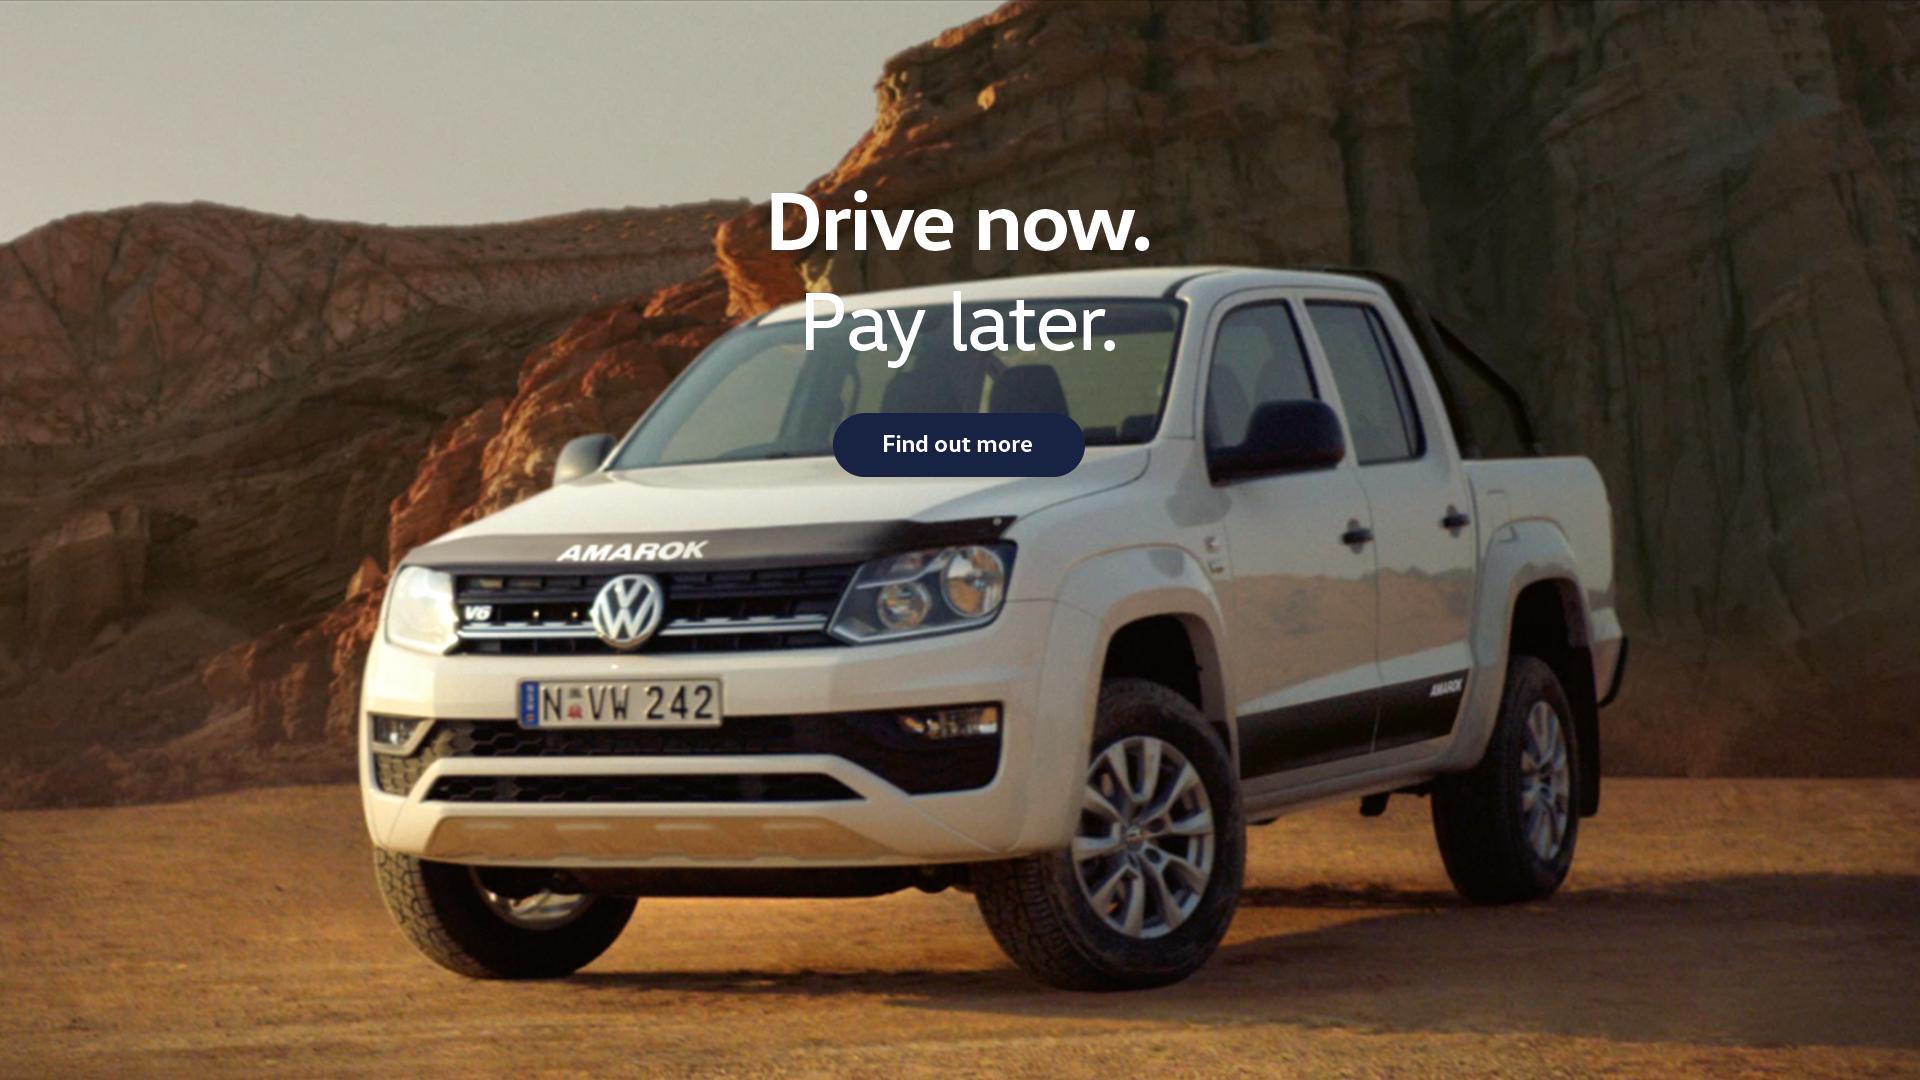 Volkswagen Amarok. Drive now. Pay later. Test drive today at Cricks Volkswagen Sunshine Coast